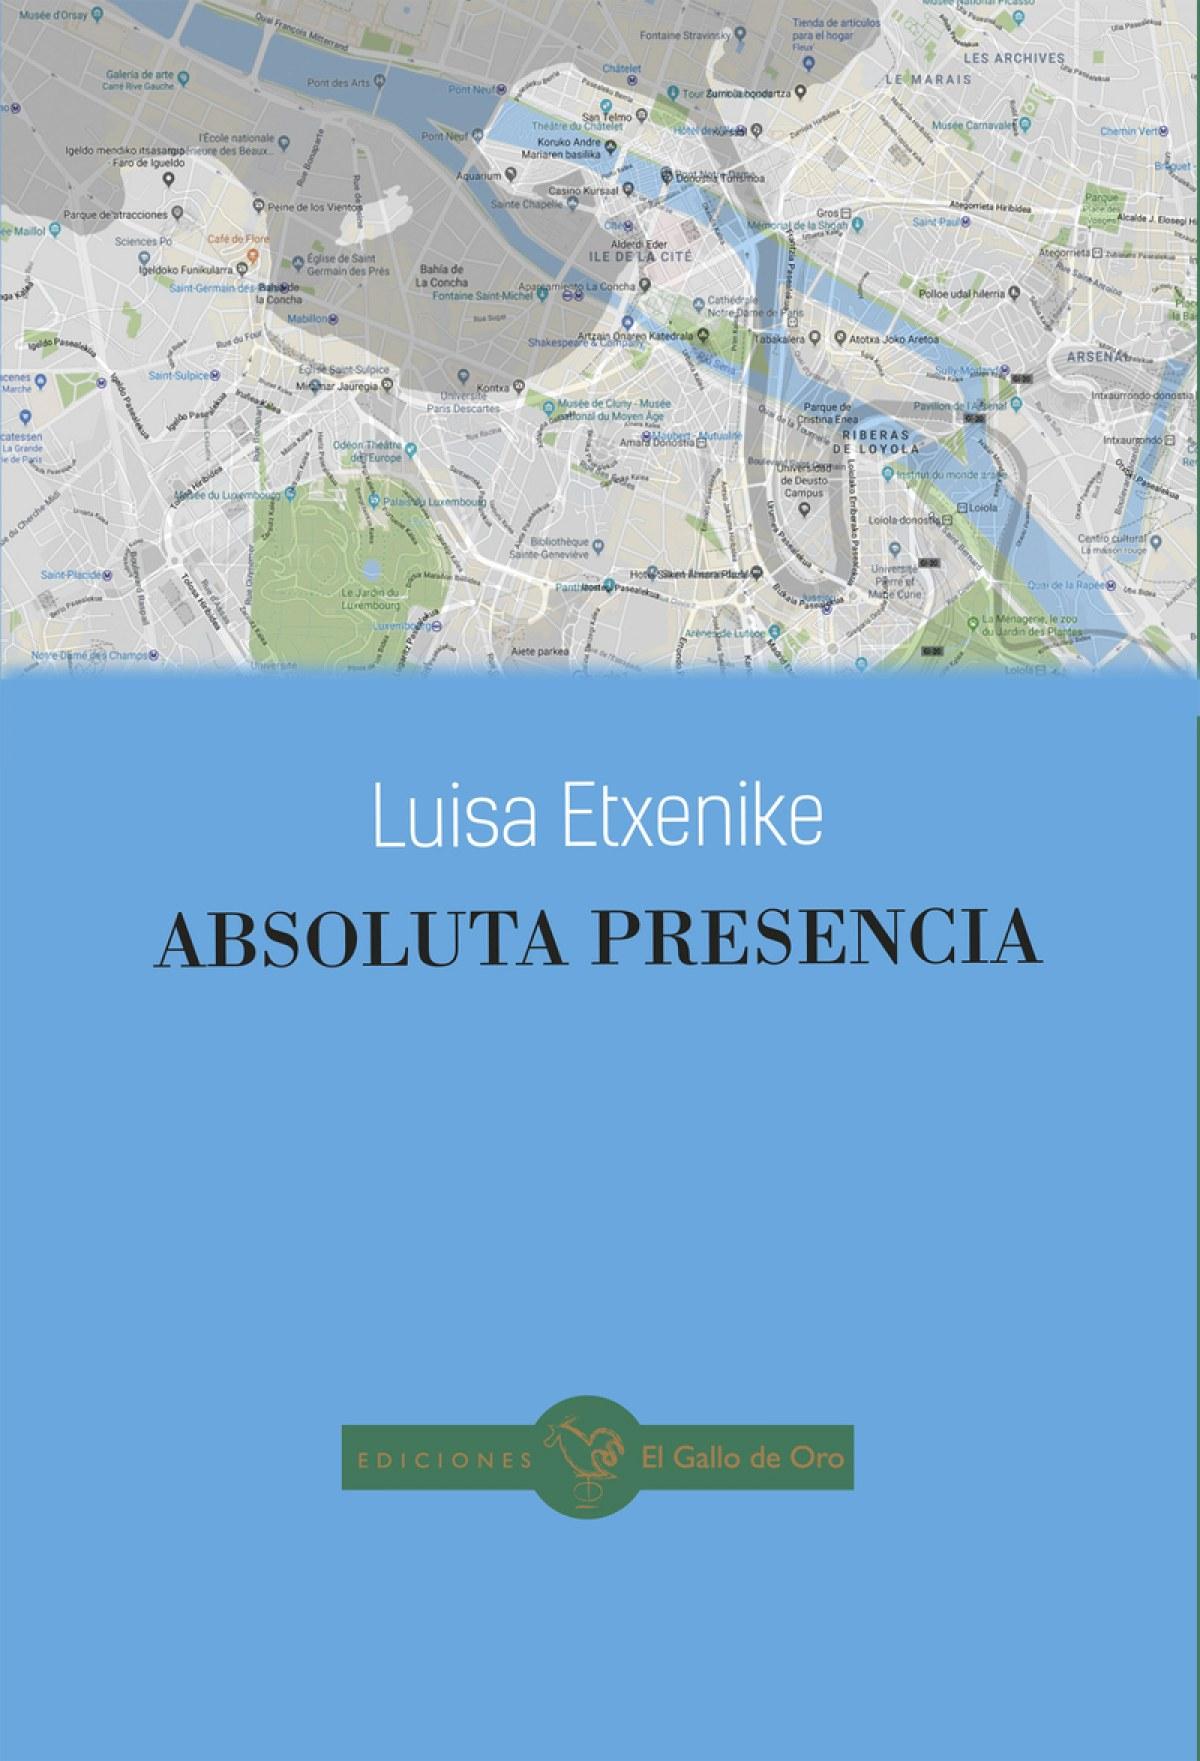 ABSOLUTA PRESENCIA 9788416575329